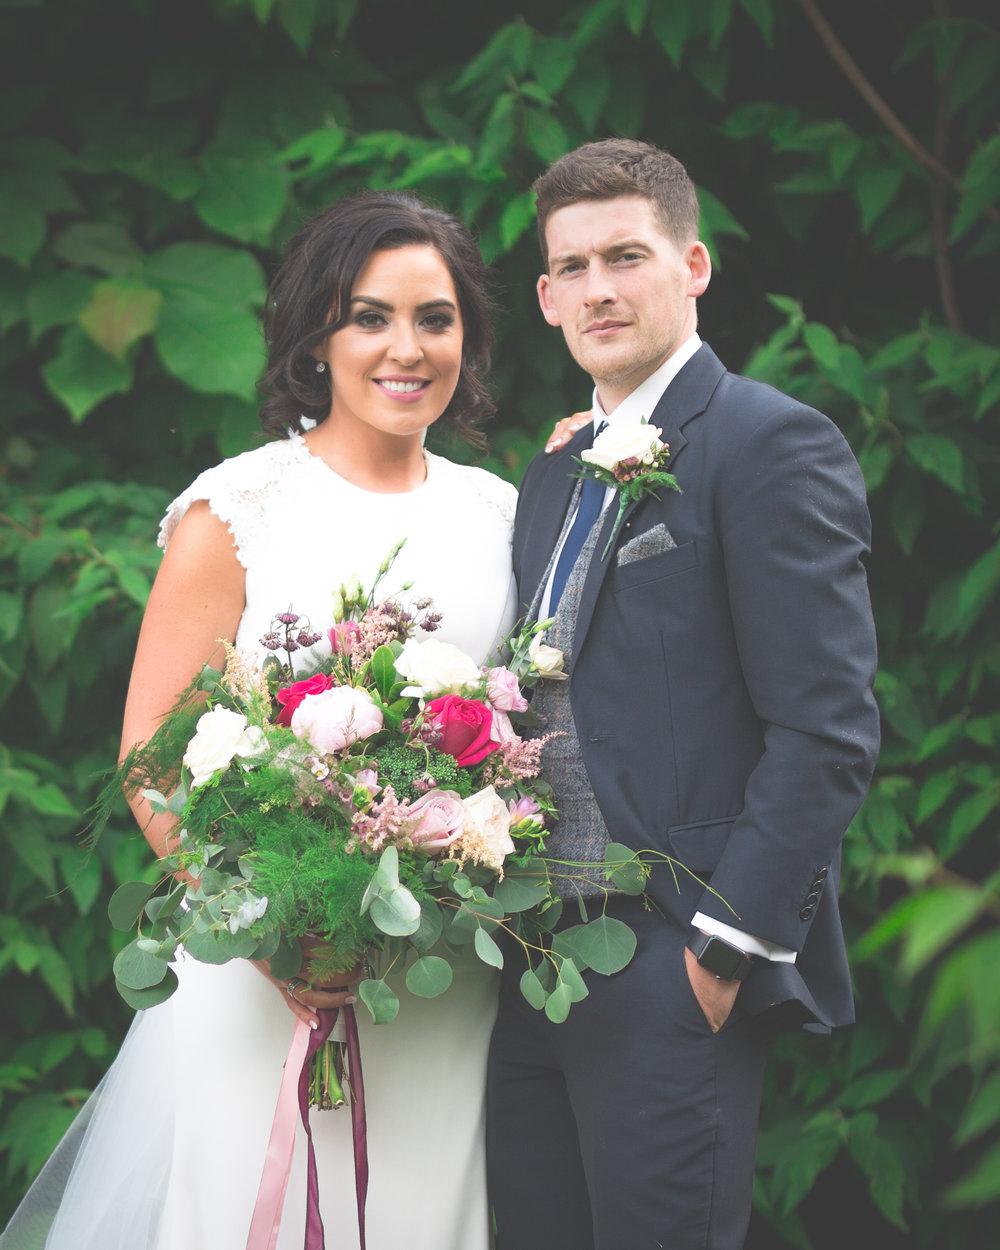 Brian McEwan Wedding Photography | Carol-Anne & Sean | The Portraits-69.jpg